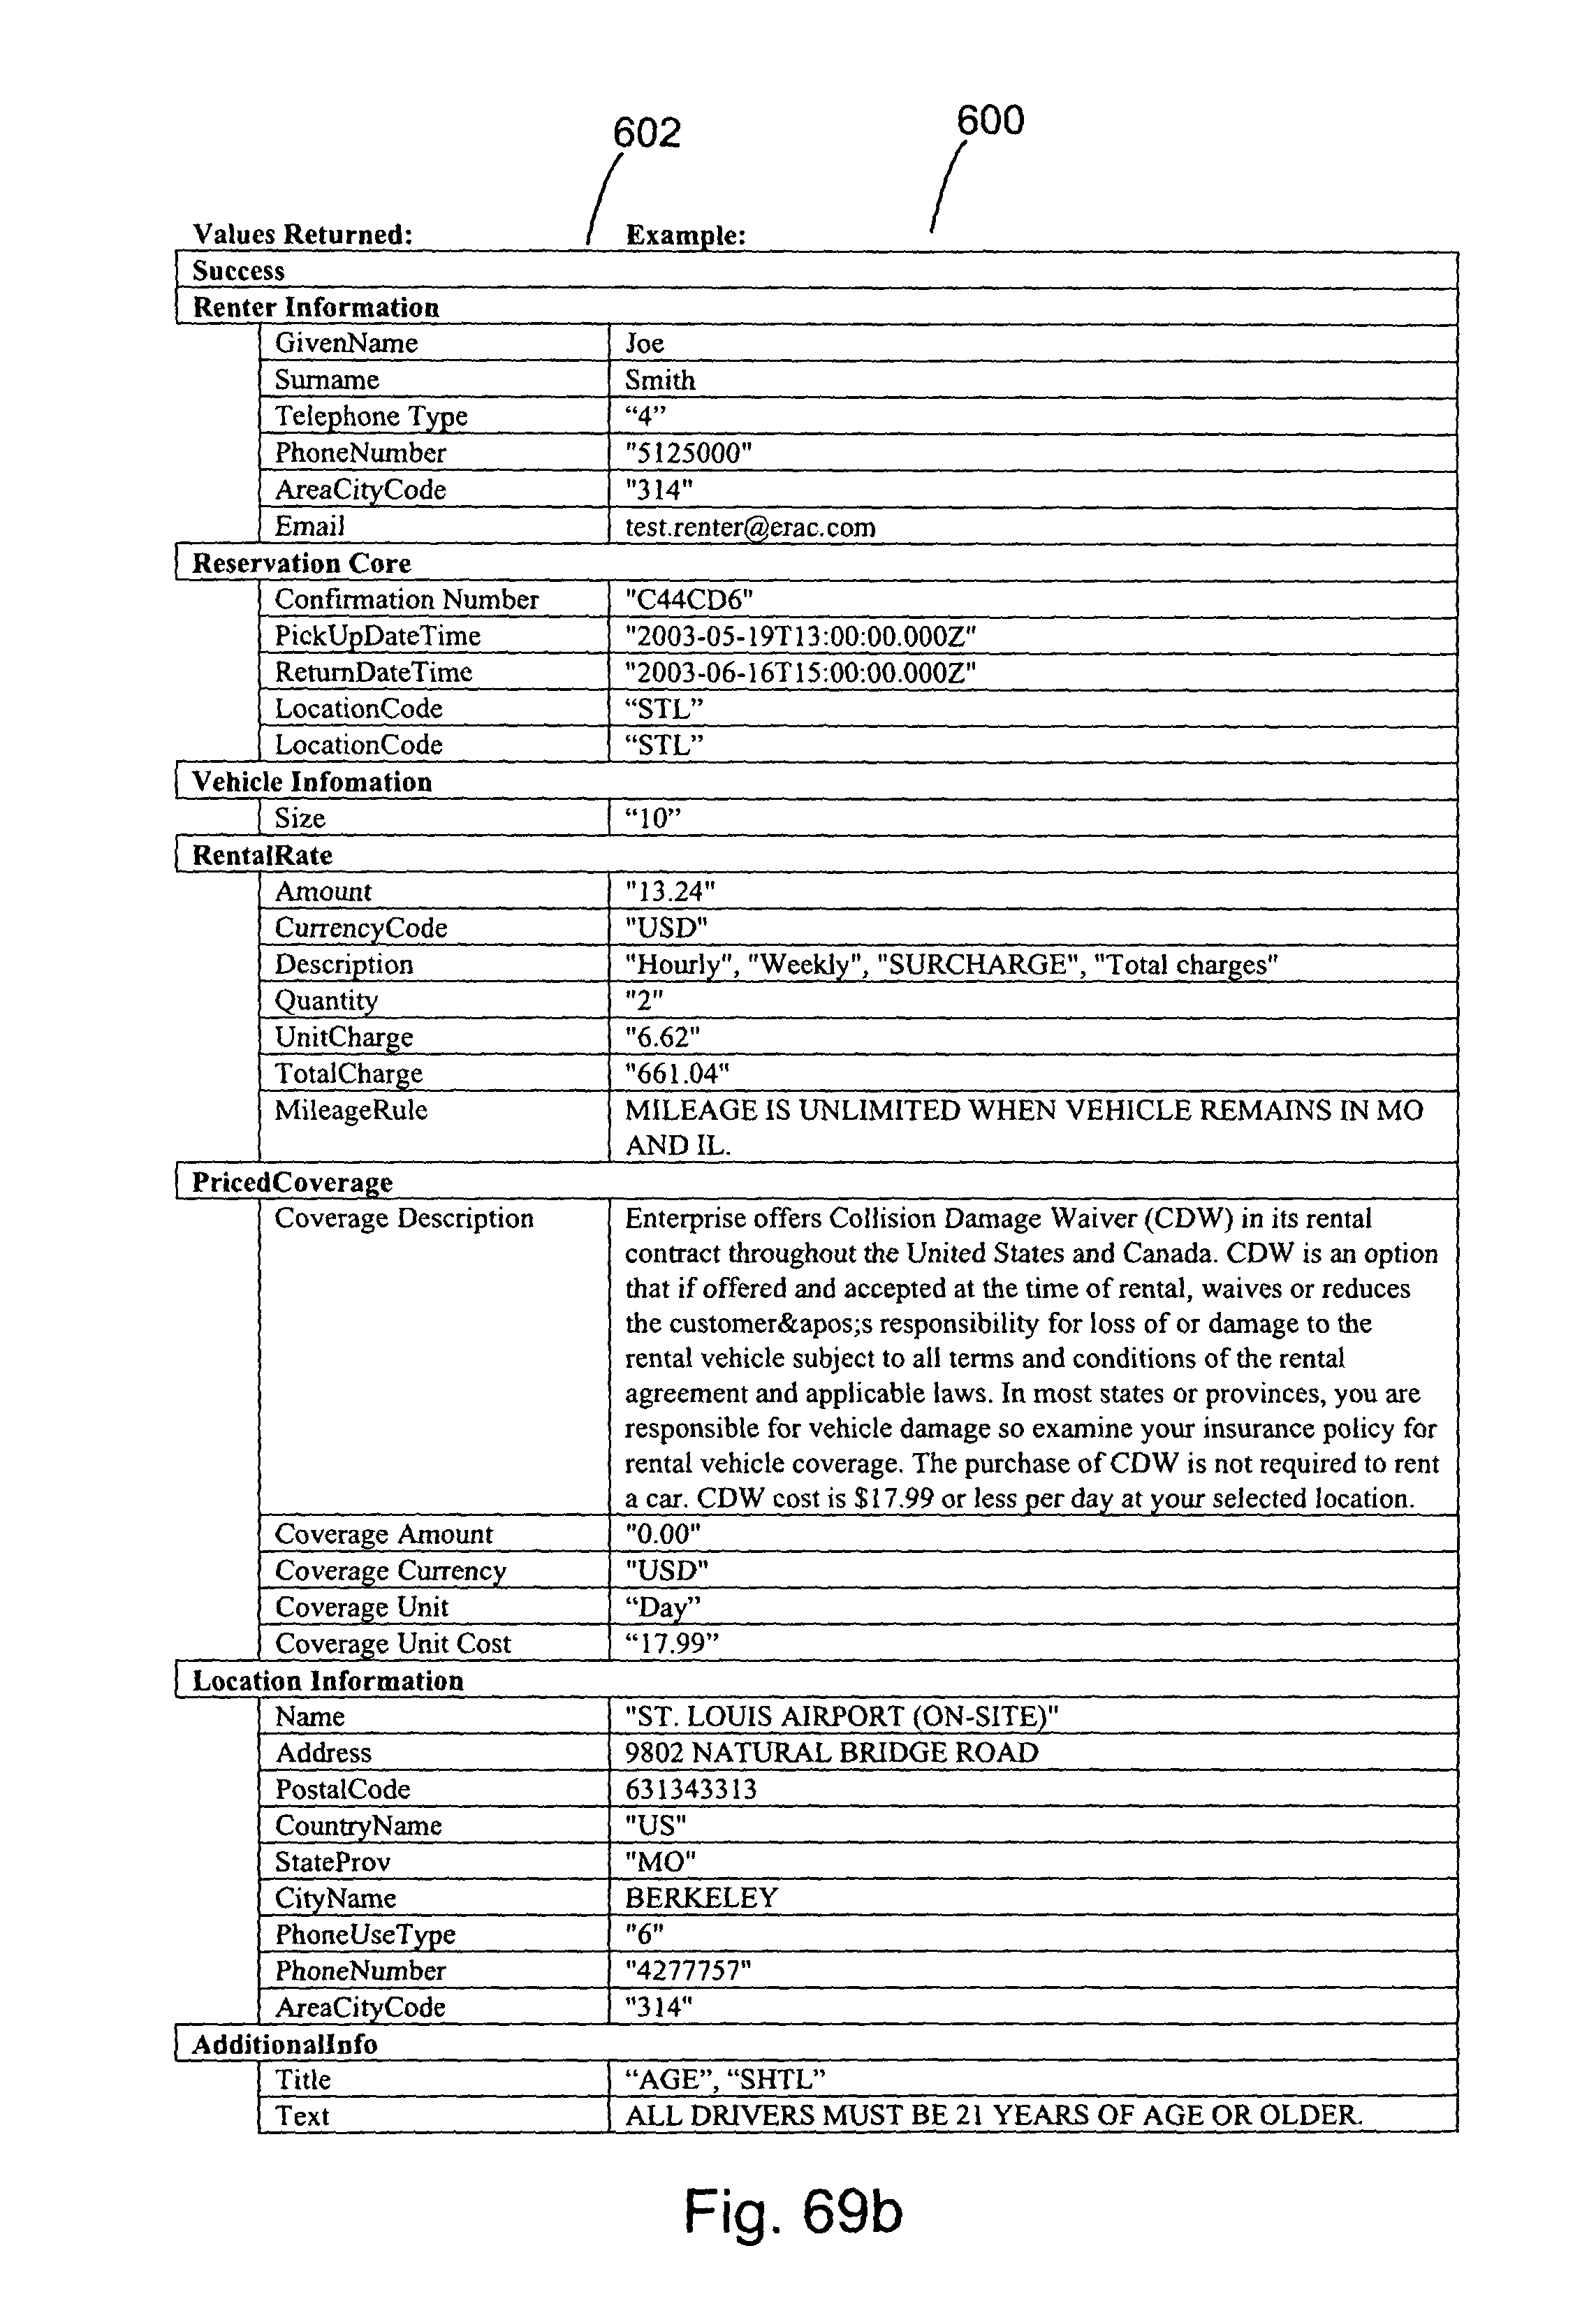 Patent US 8,108,231 B2